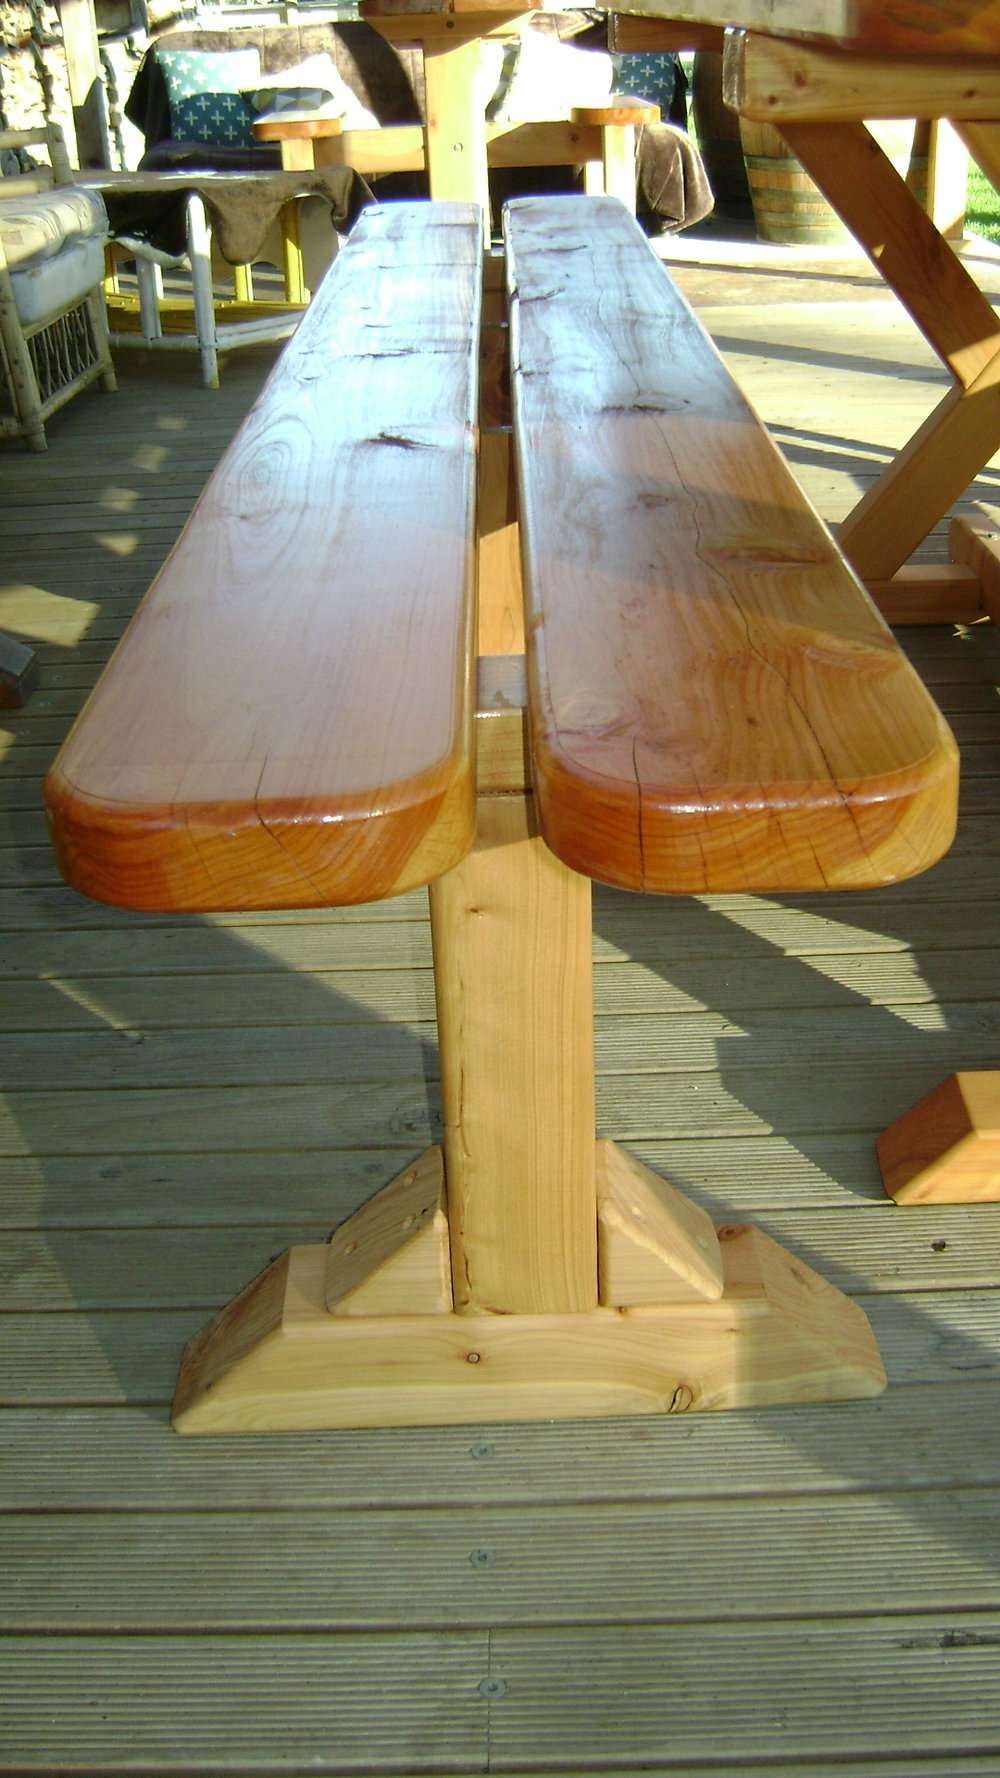 table banch kombo 1 (17).JPG